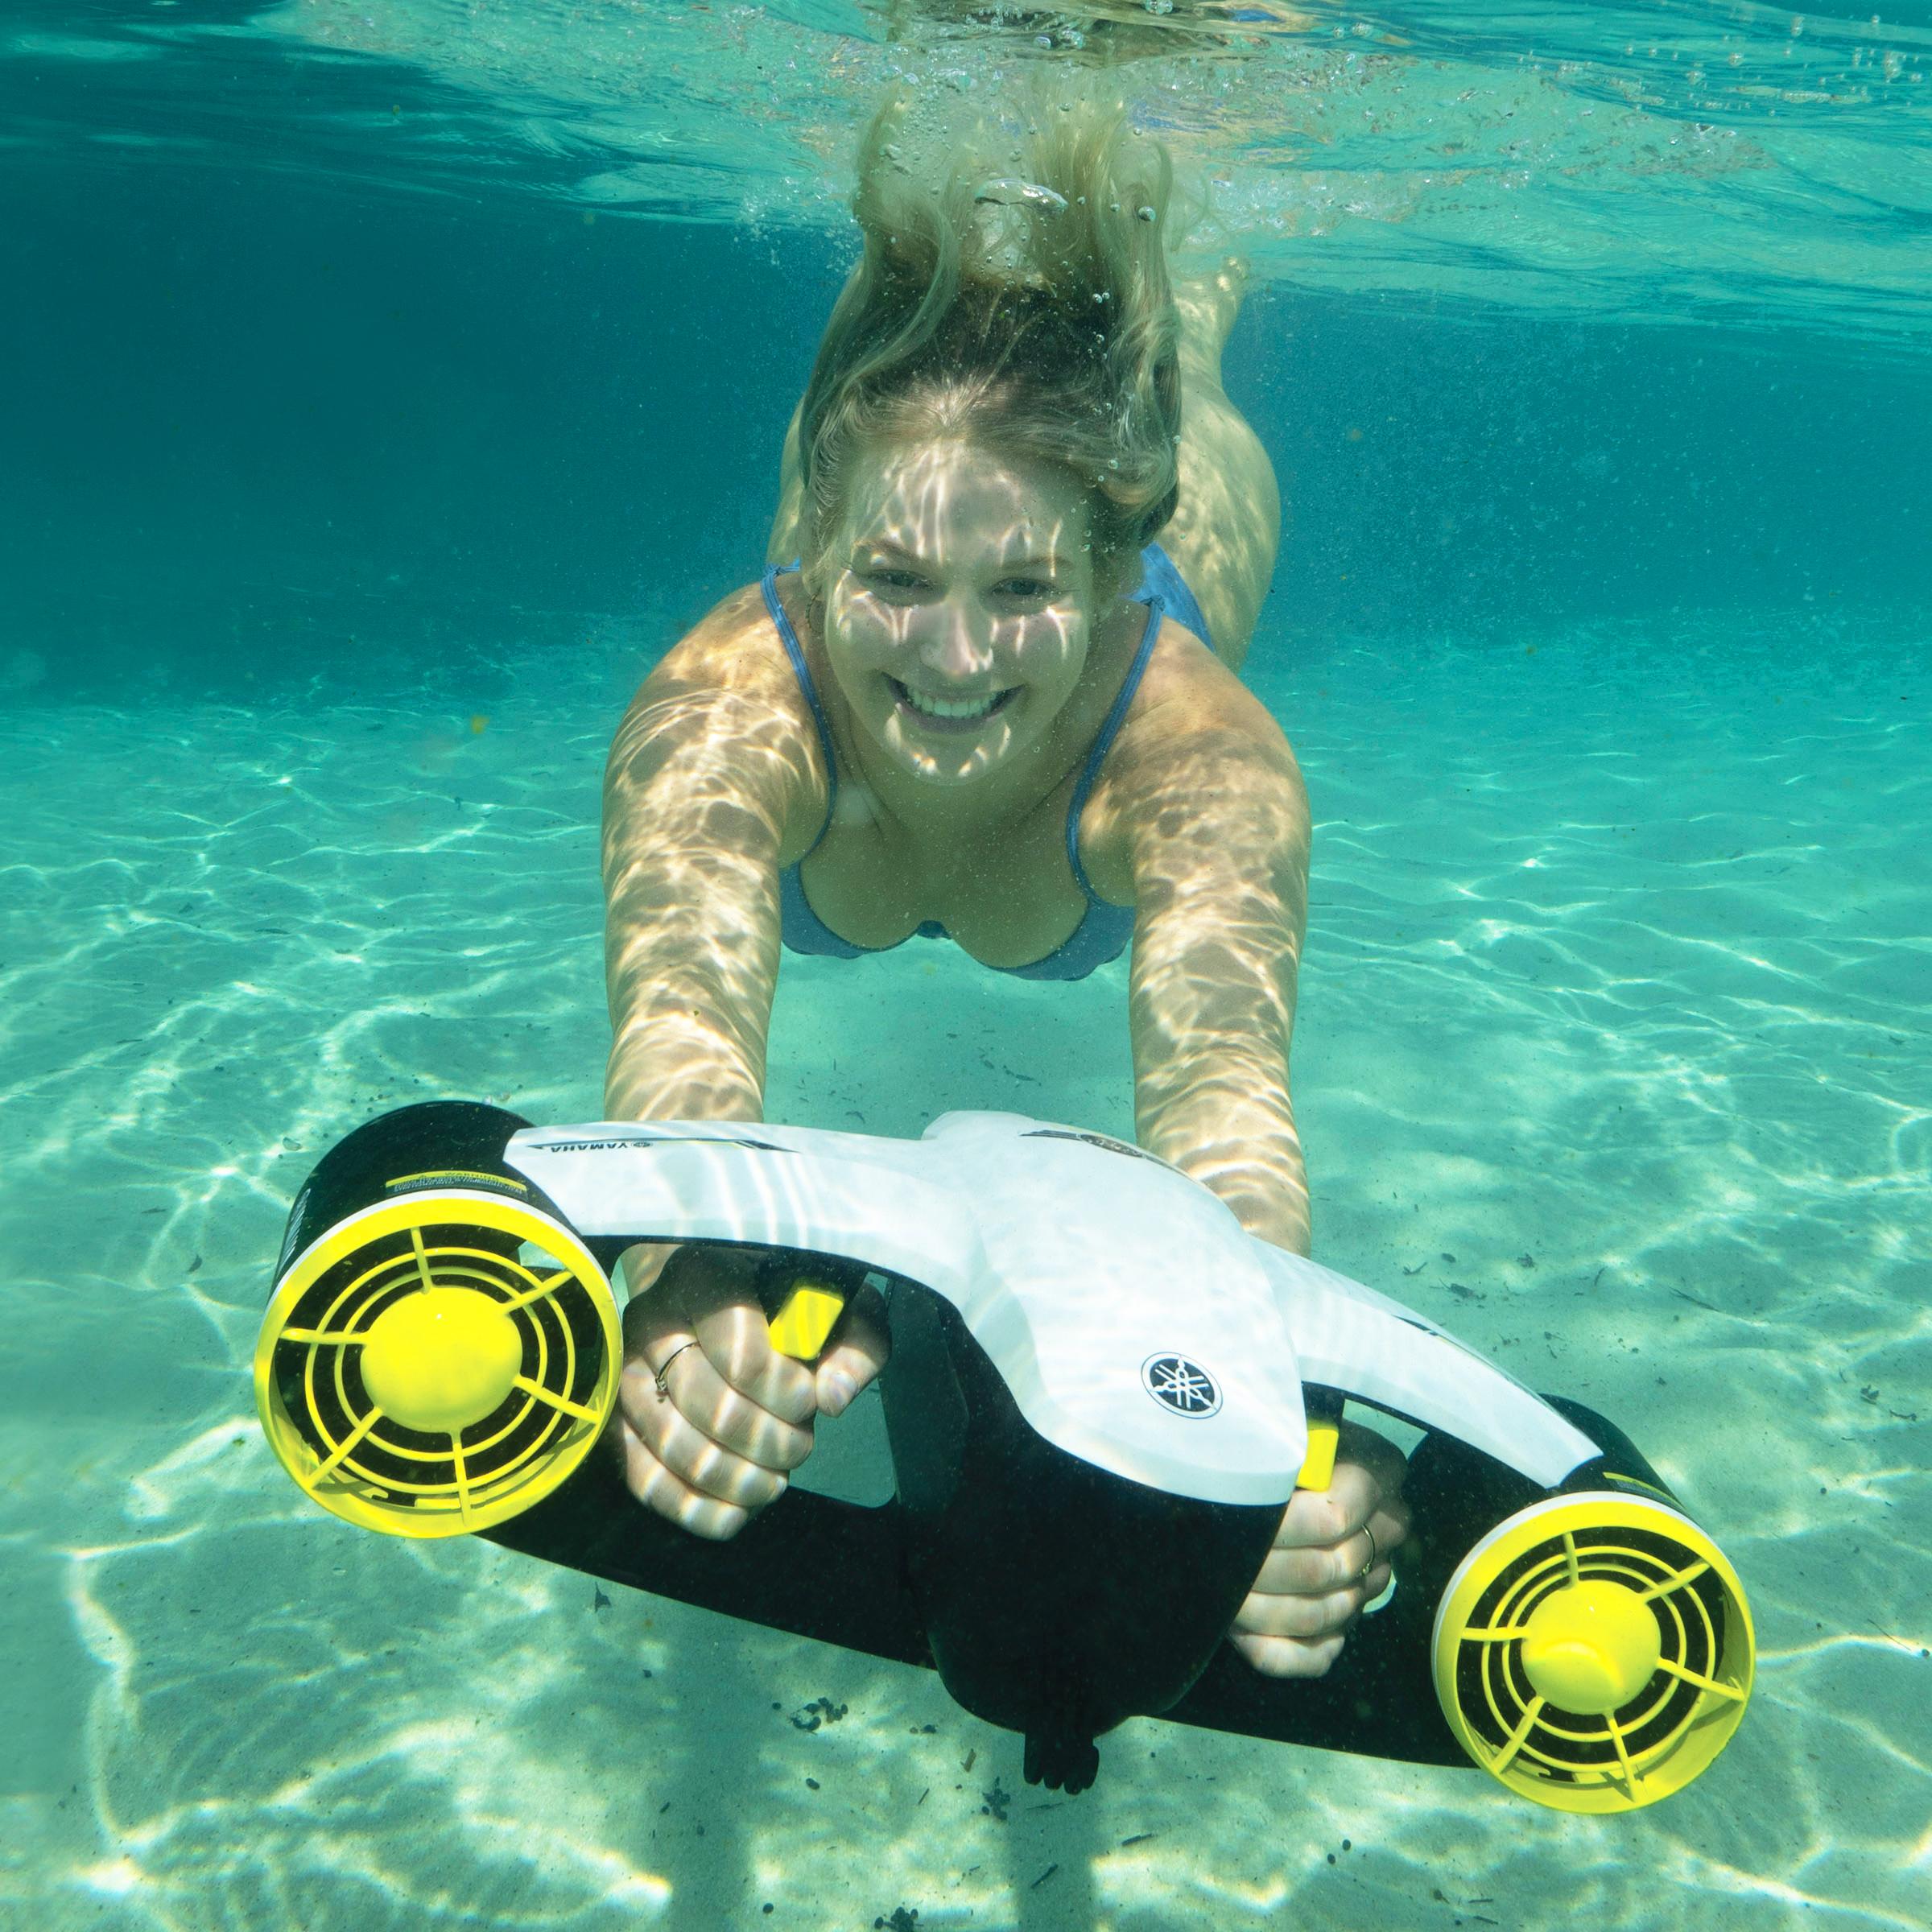 Scooter sous marin Yamaha Seawing plongée